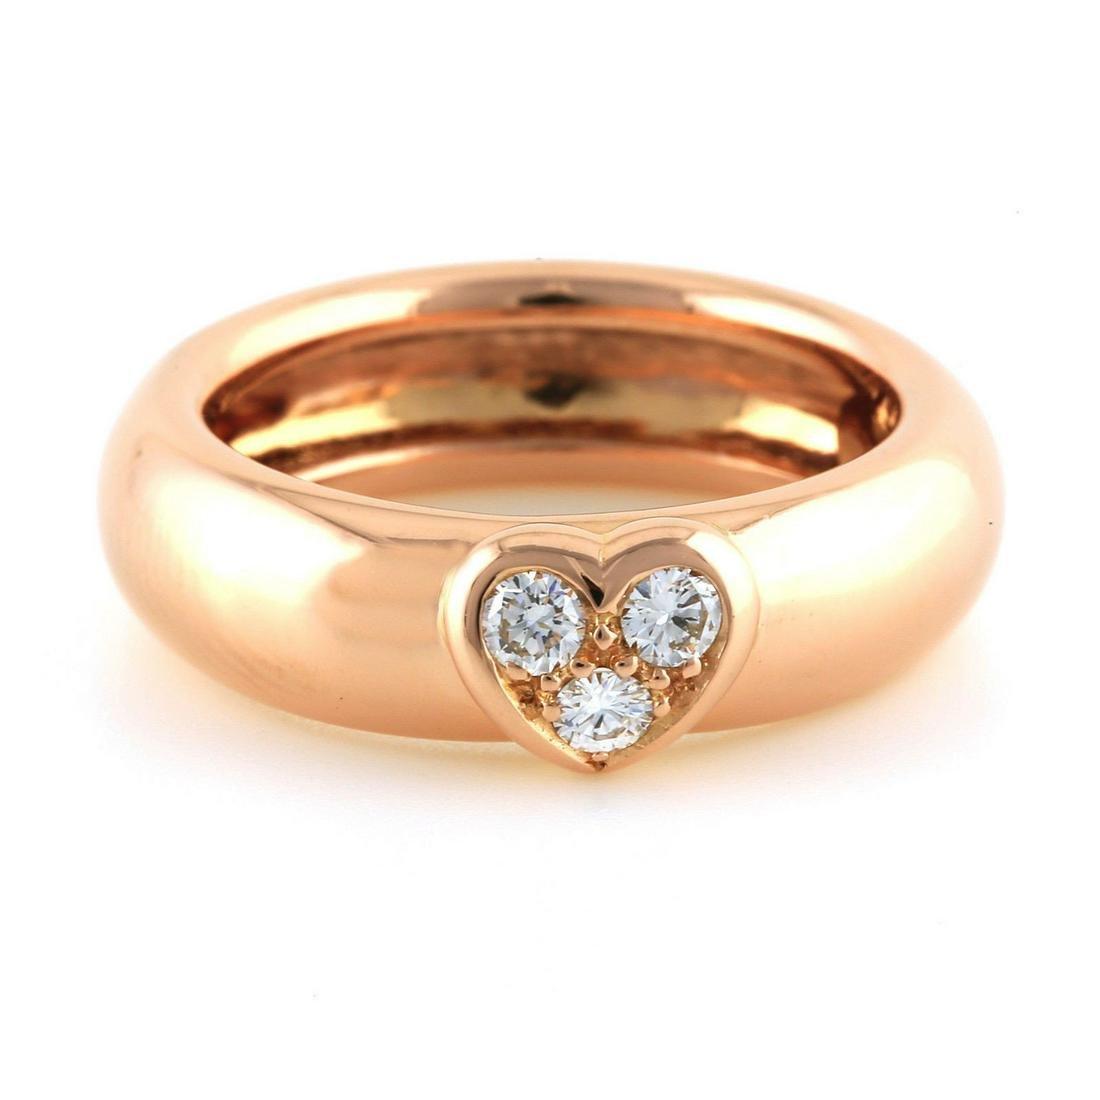 TIFFANY 18K ROSE PINK GOLD 3 DIAMOND HEART RING Size 7